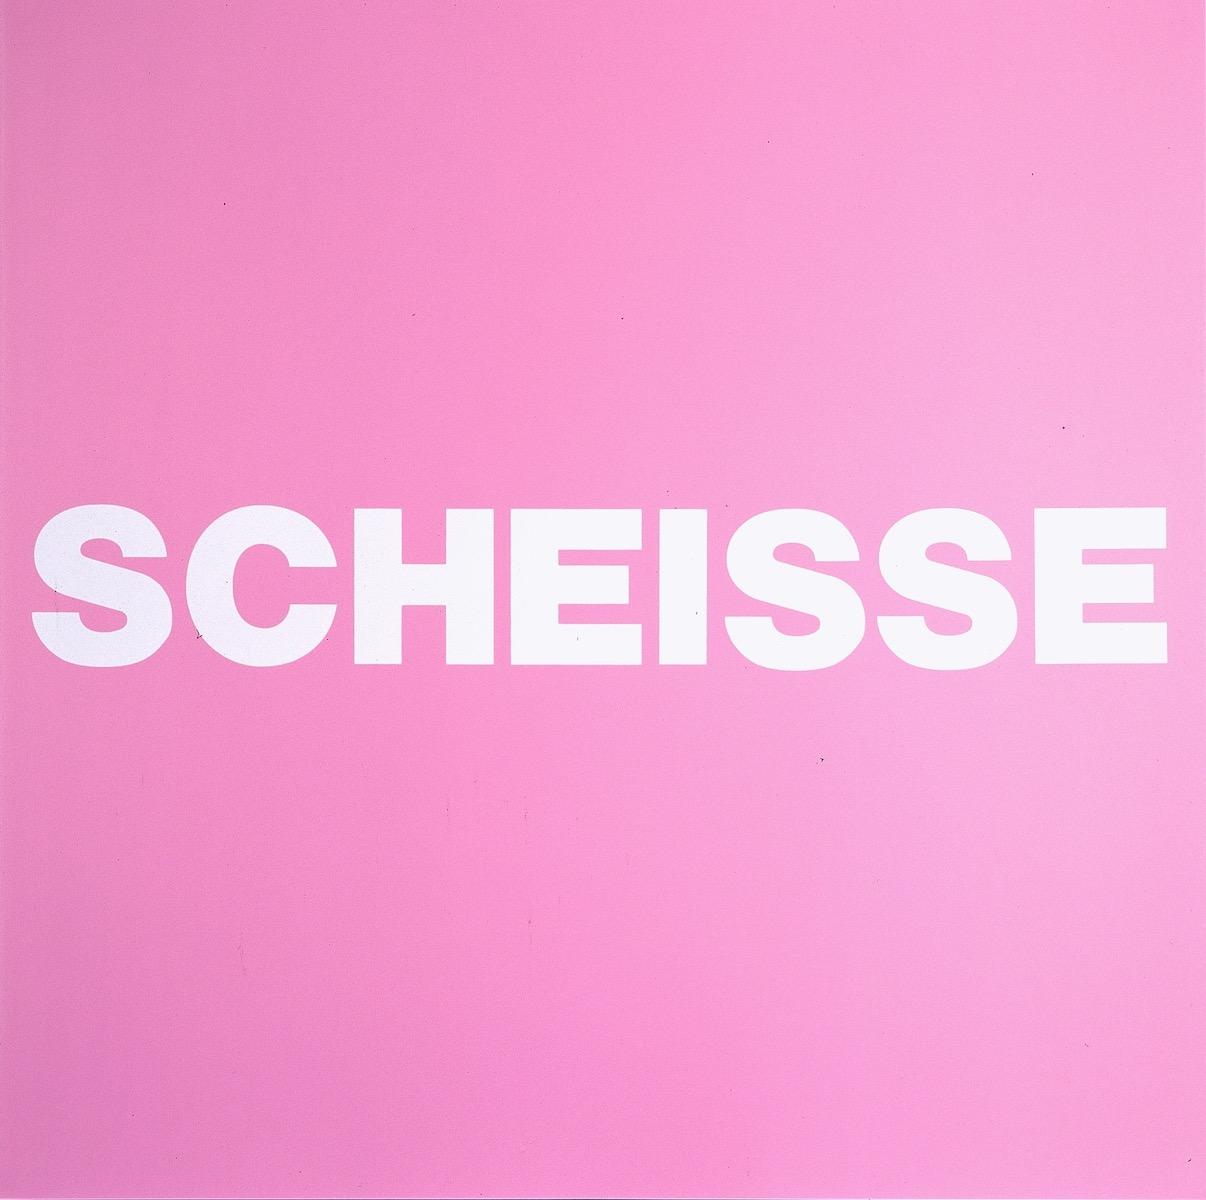 SCHEISSE, ROSA | Affirmation tut gut | Angelika Beuler | 1992